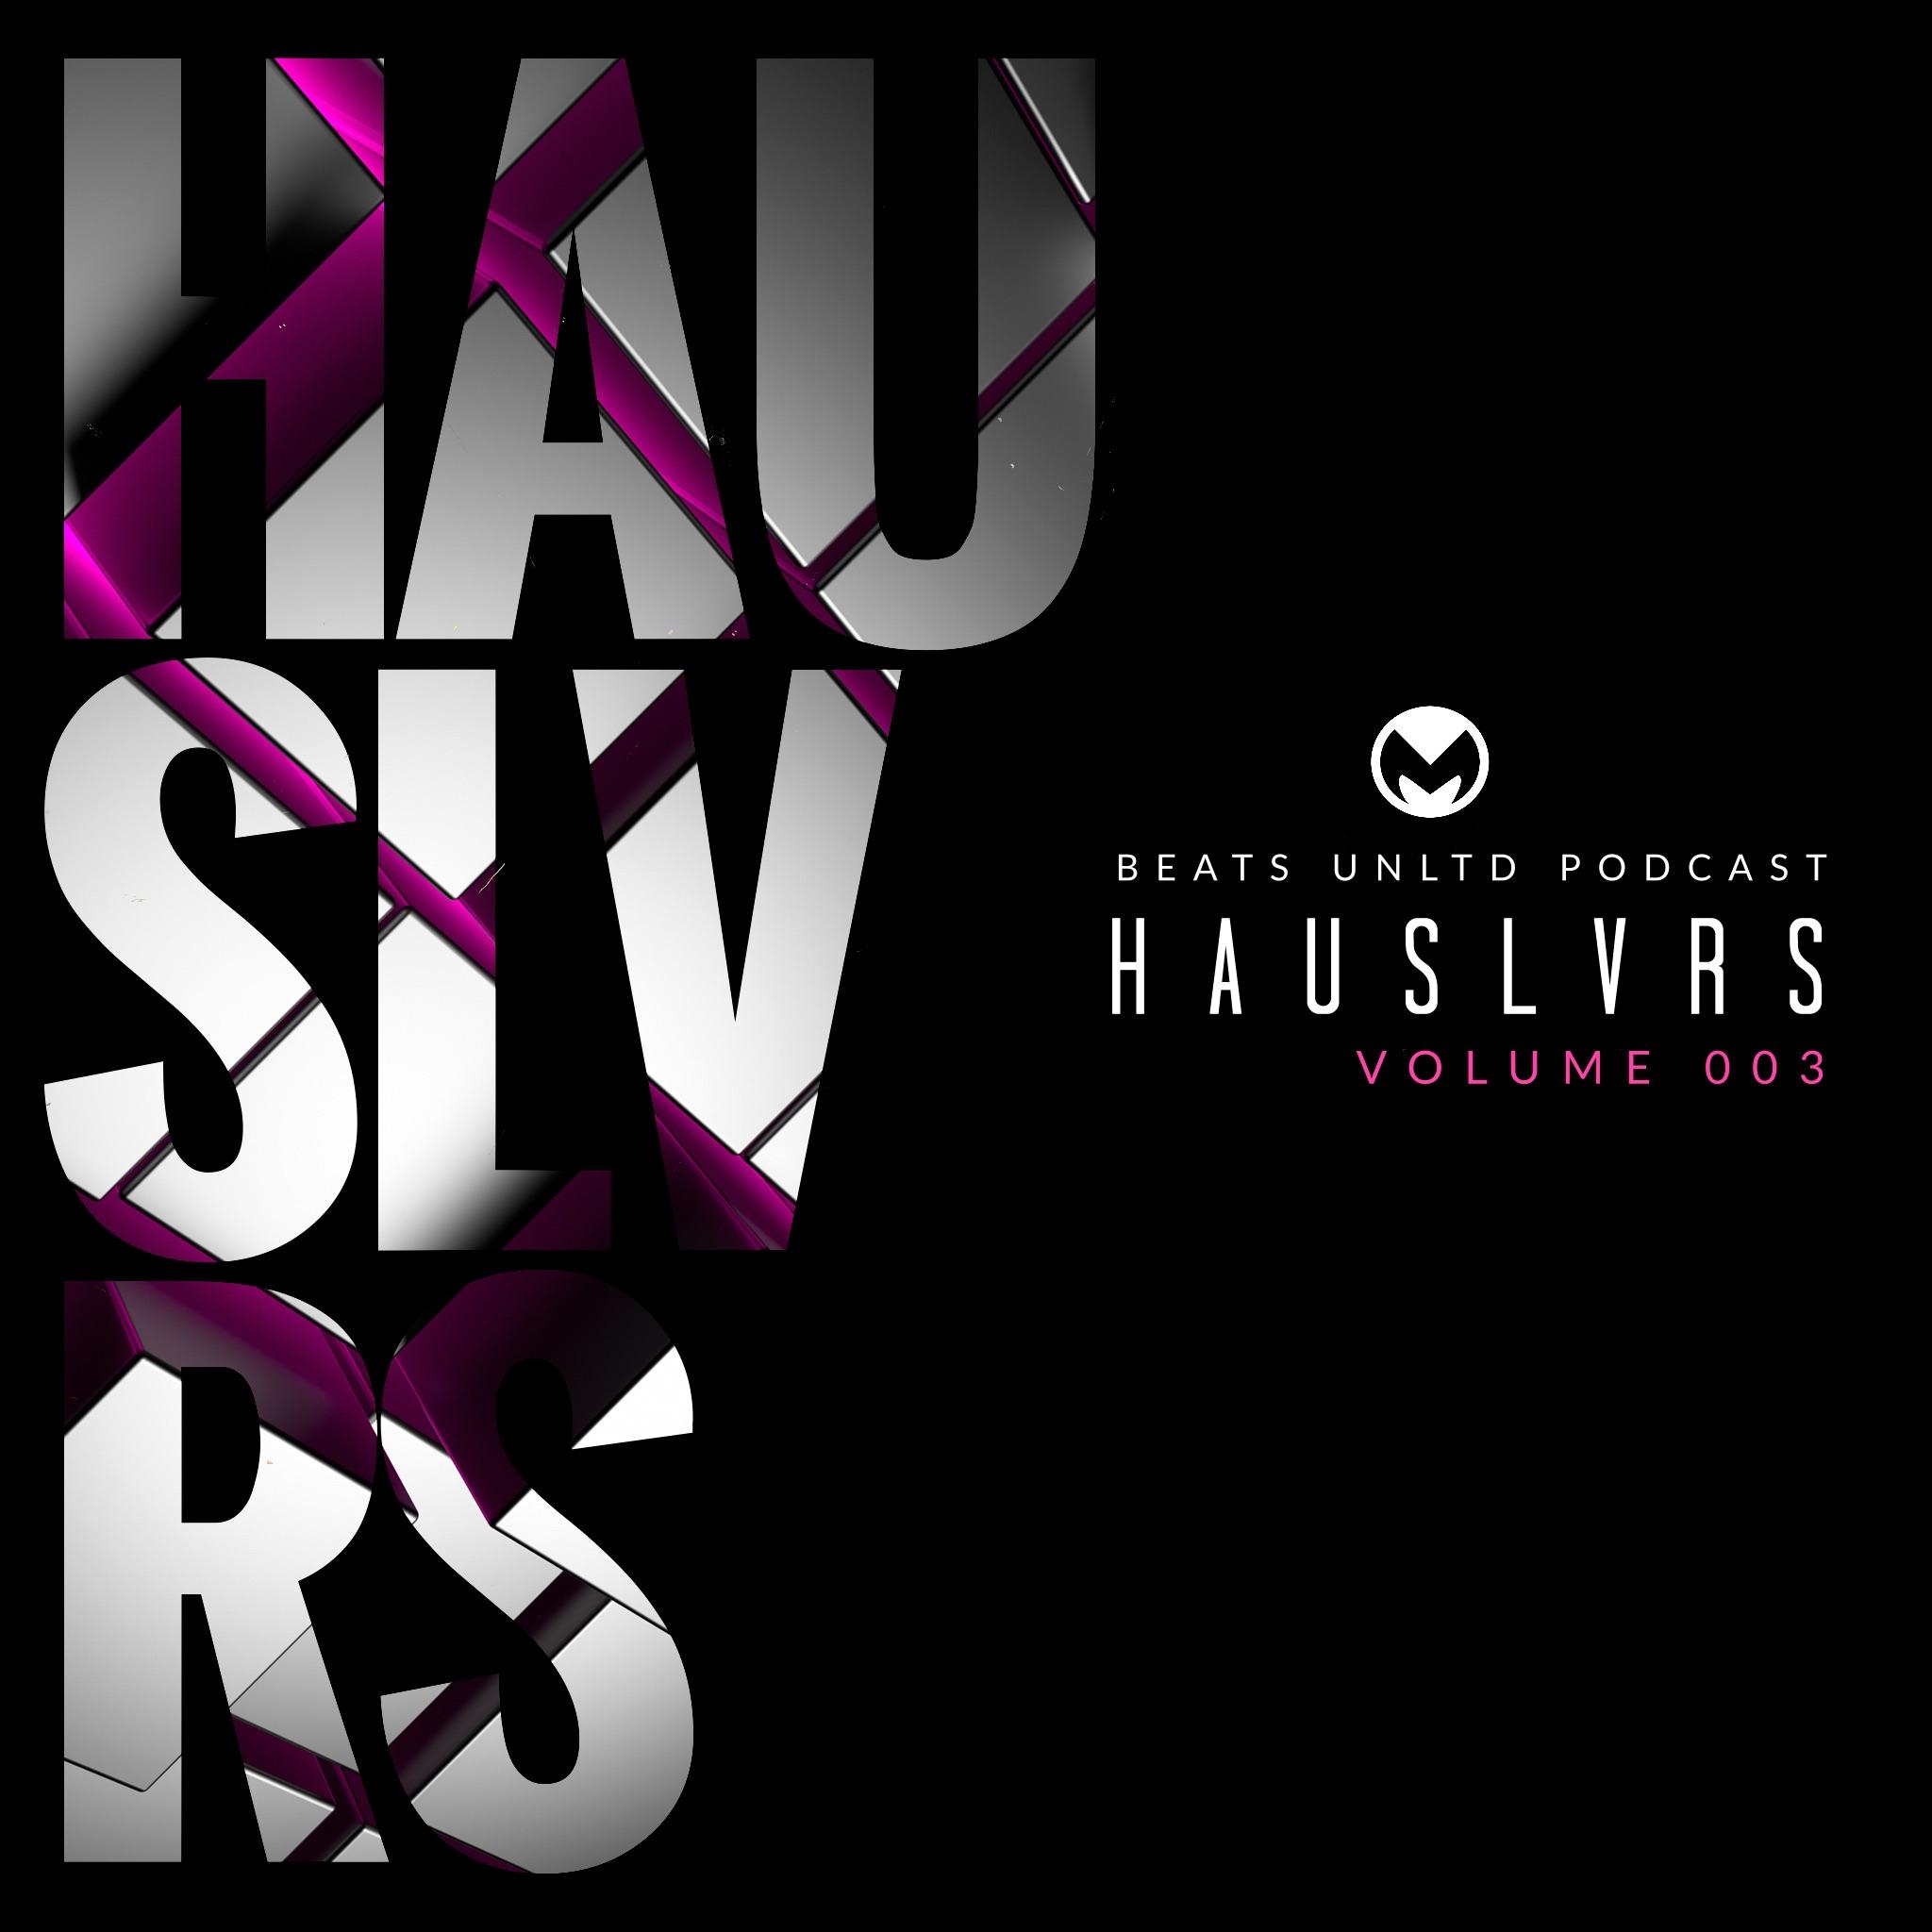 235 HausLvrs Volume 003